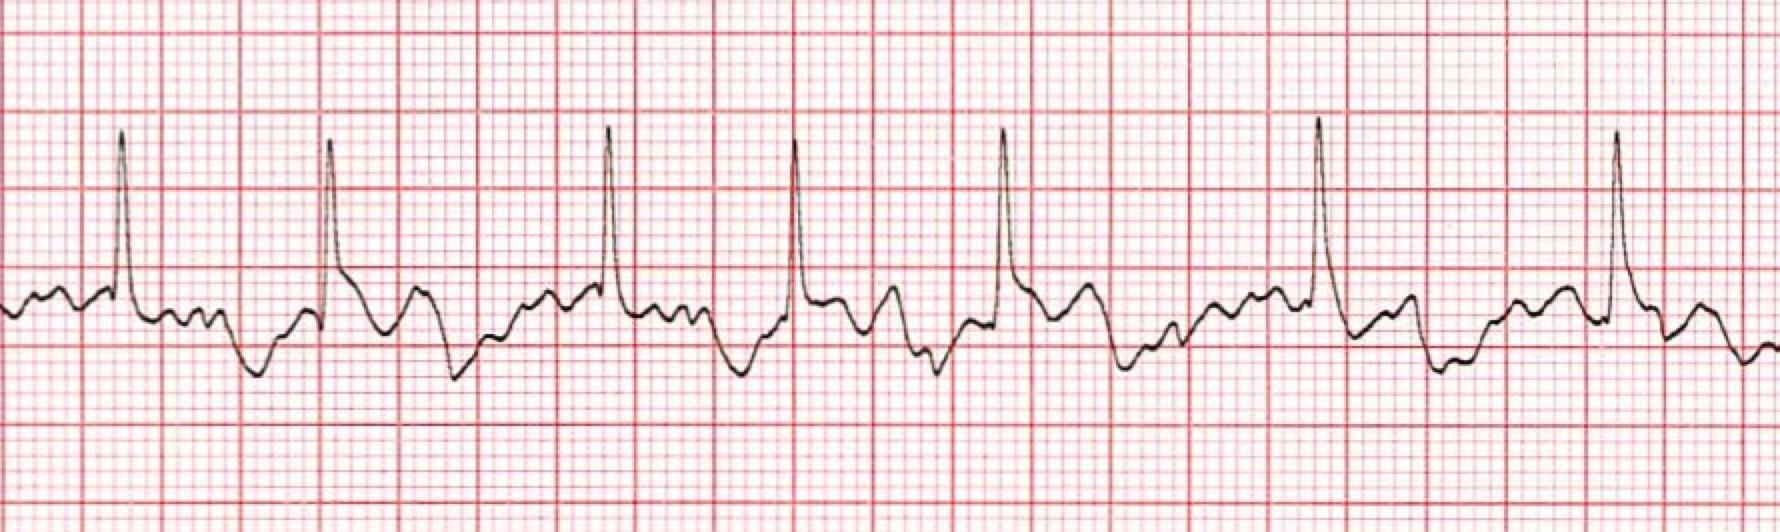 Atrial Fibrillation ECG/EKG